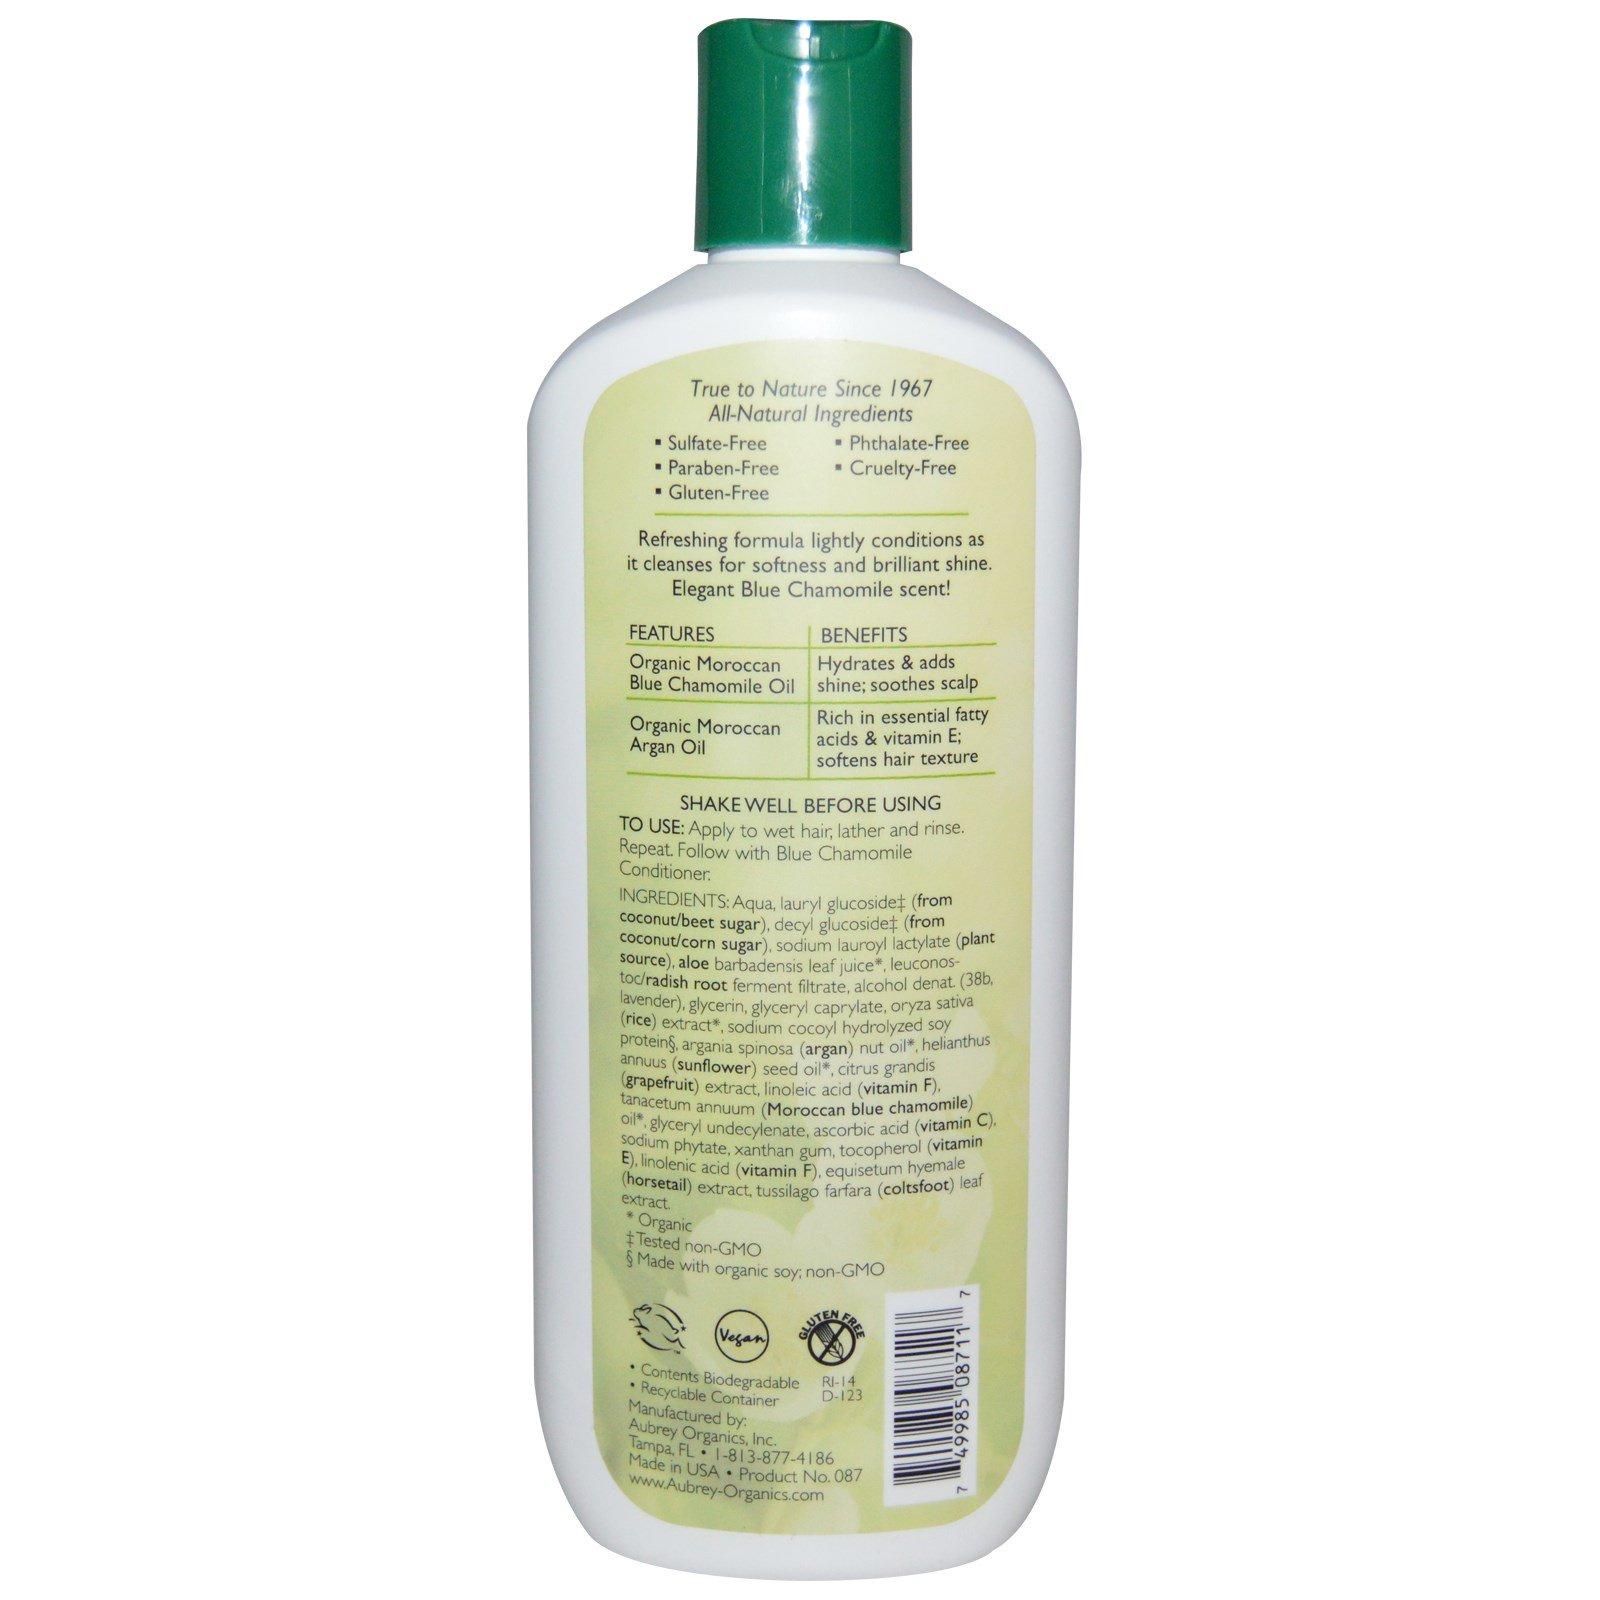 Aubrey Organics - Moroccan Argan Oil - 1 oz. REN Skincare Clean Skincare Global Protection Day Cream 1.7 Oz